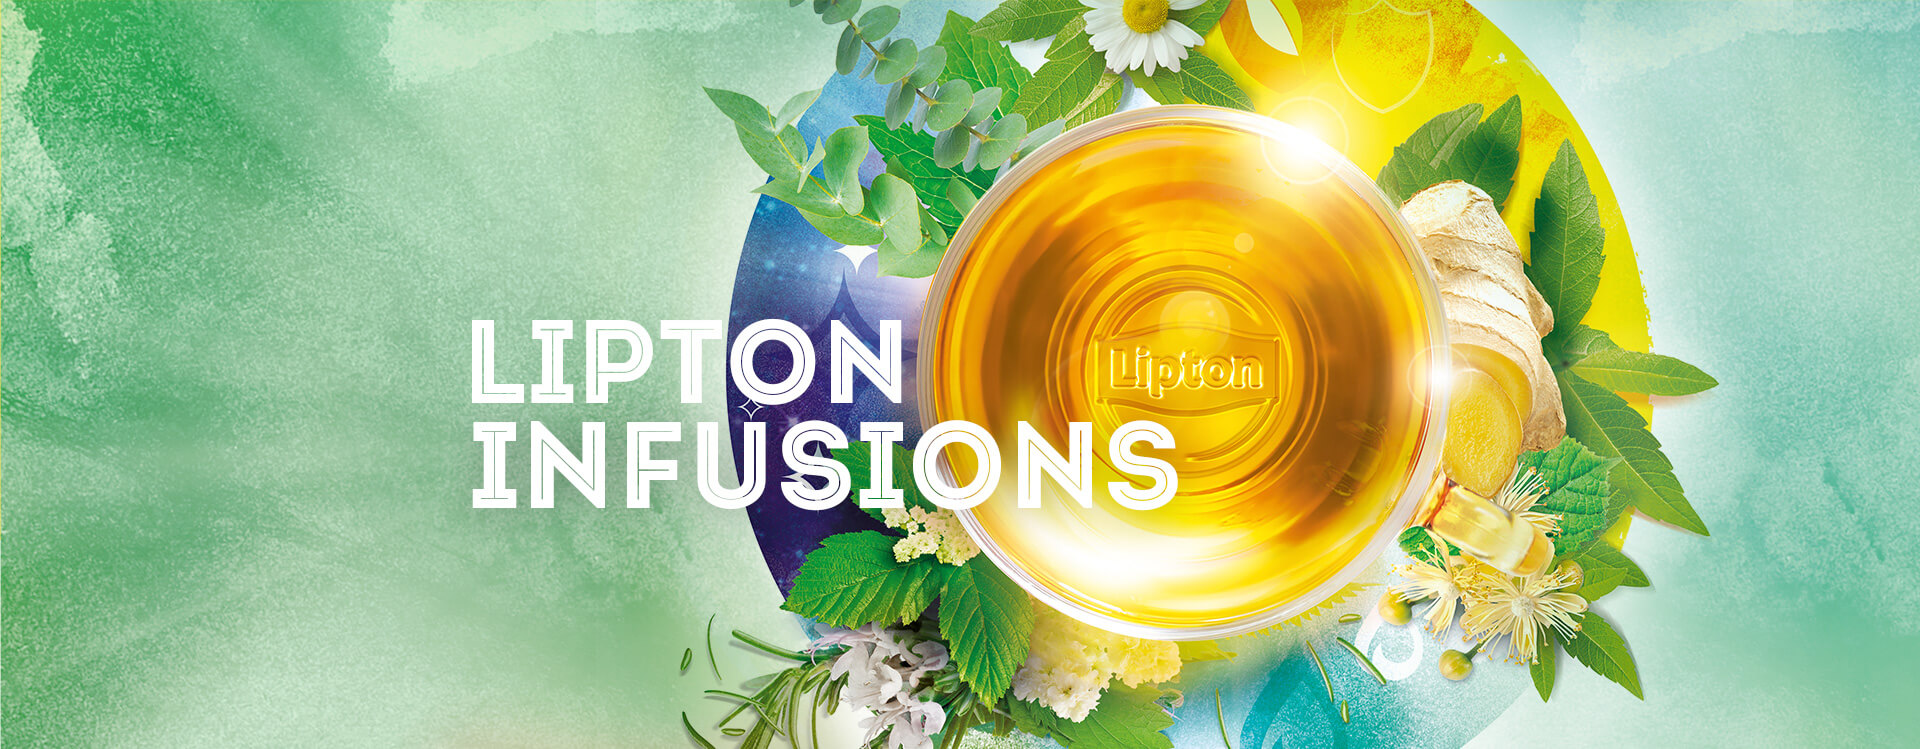 Lipton Infusions